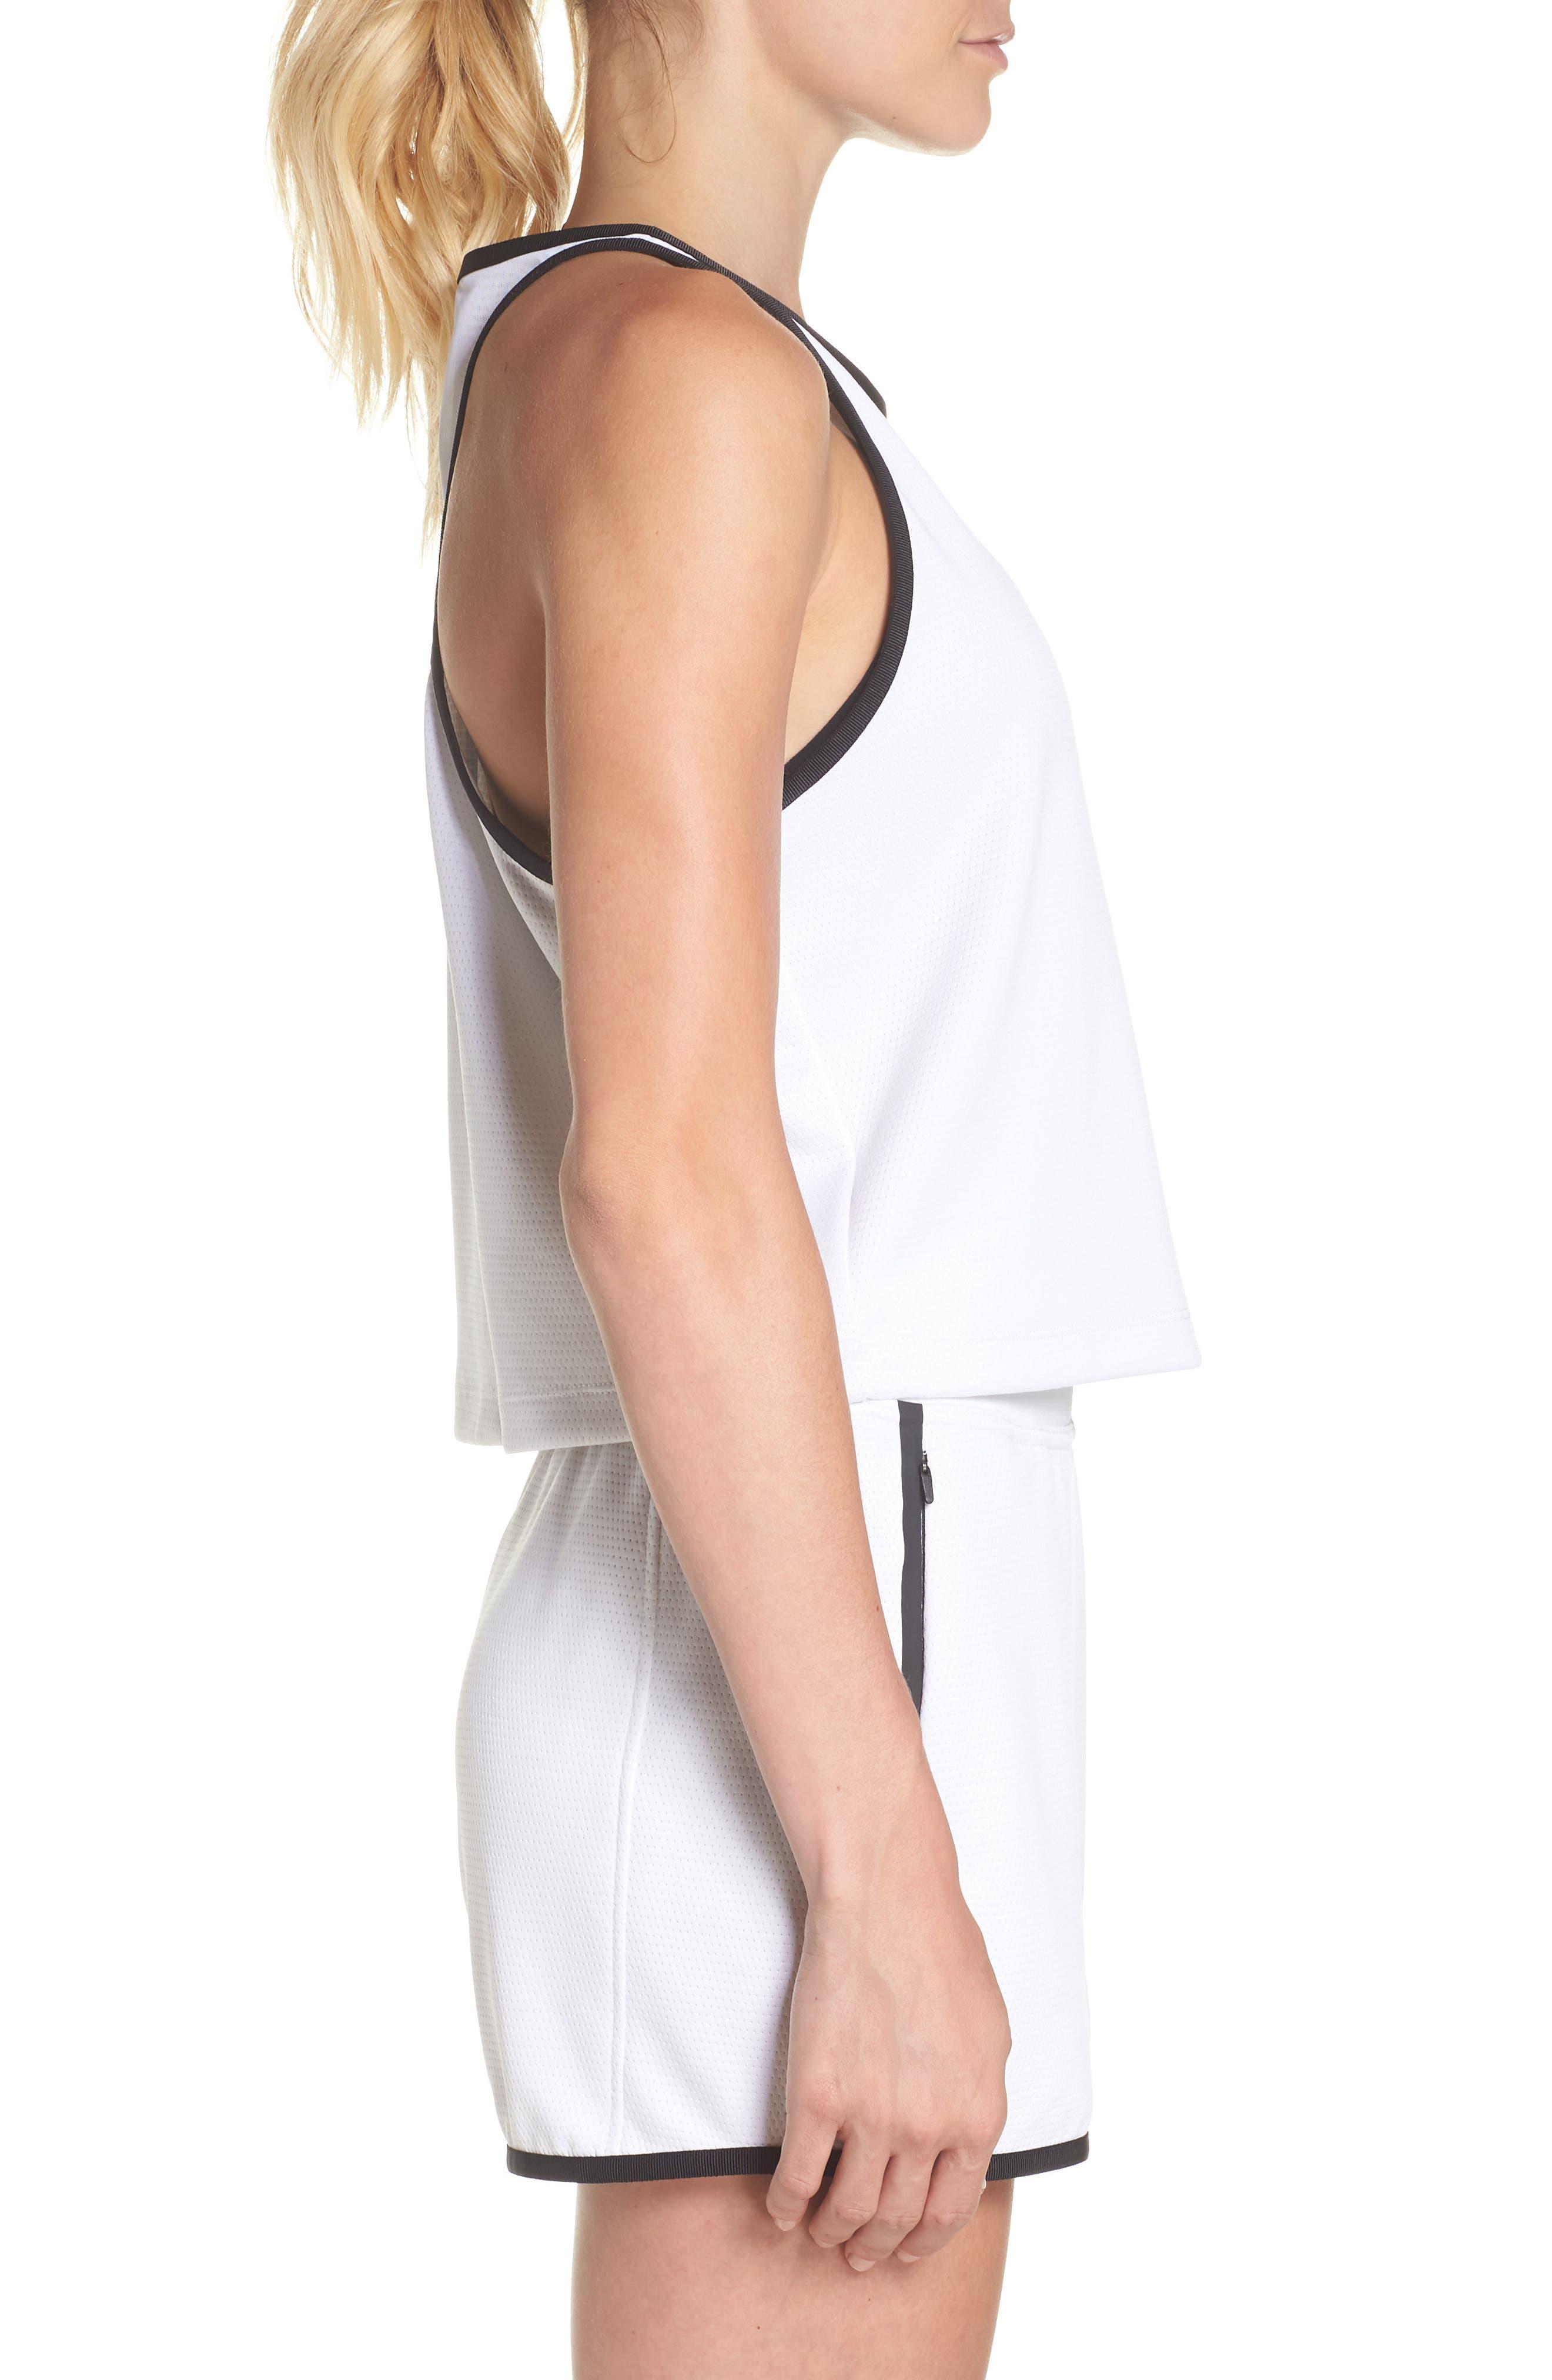 Sportswear Teched Out Tank,                             Alternate thumbnail 3, color,                             White/ Black